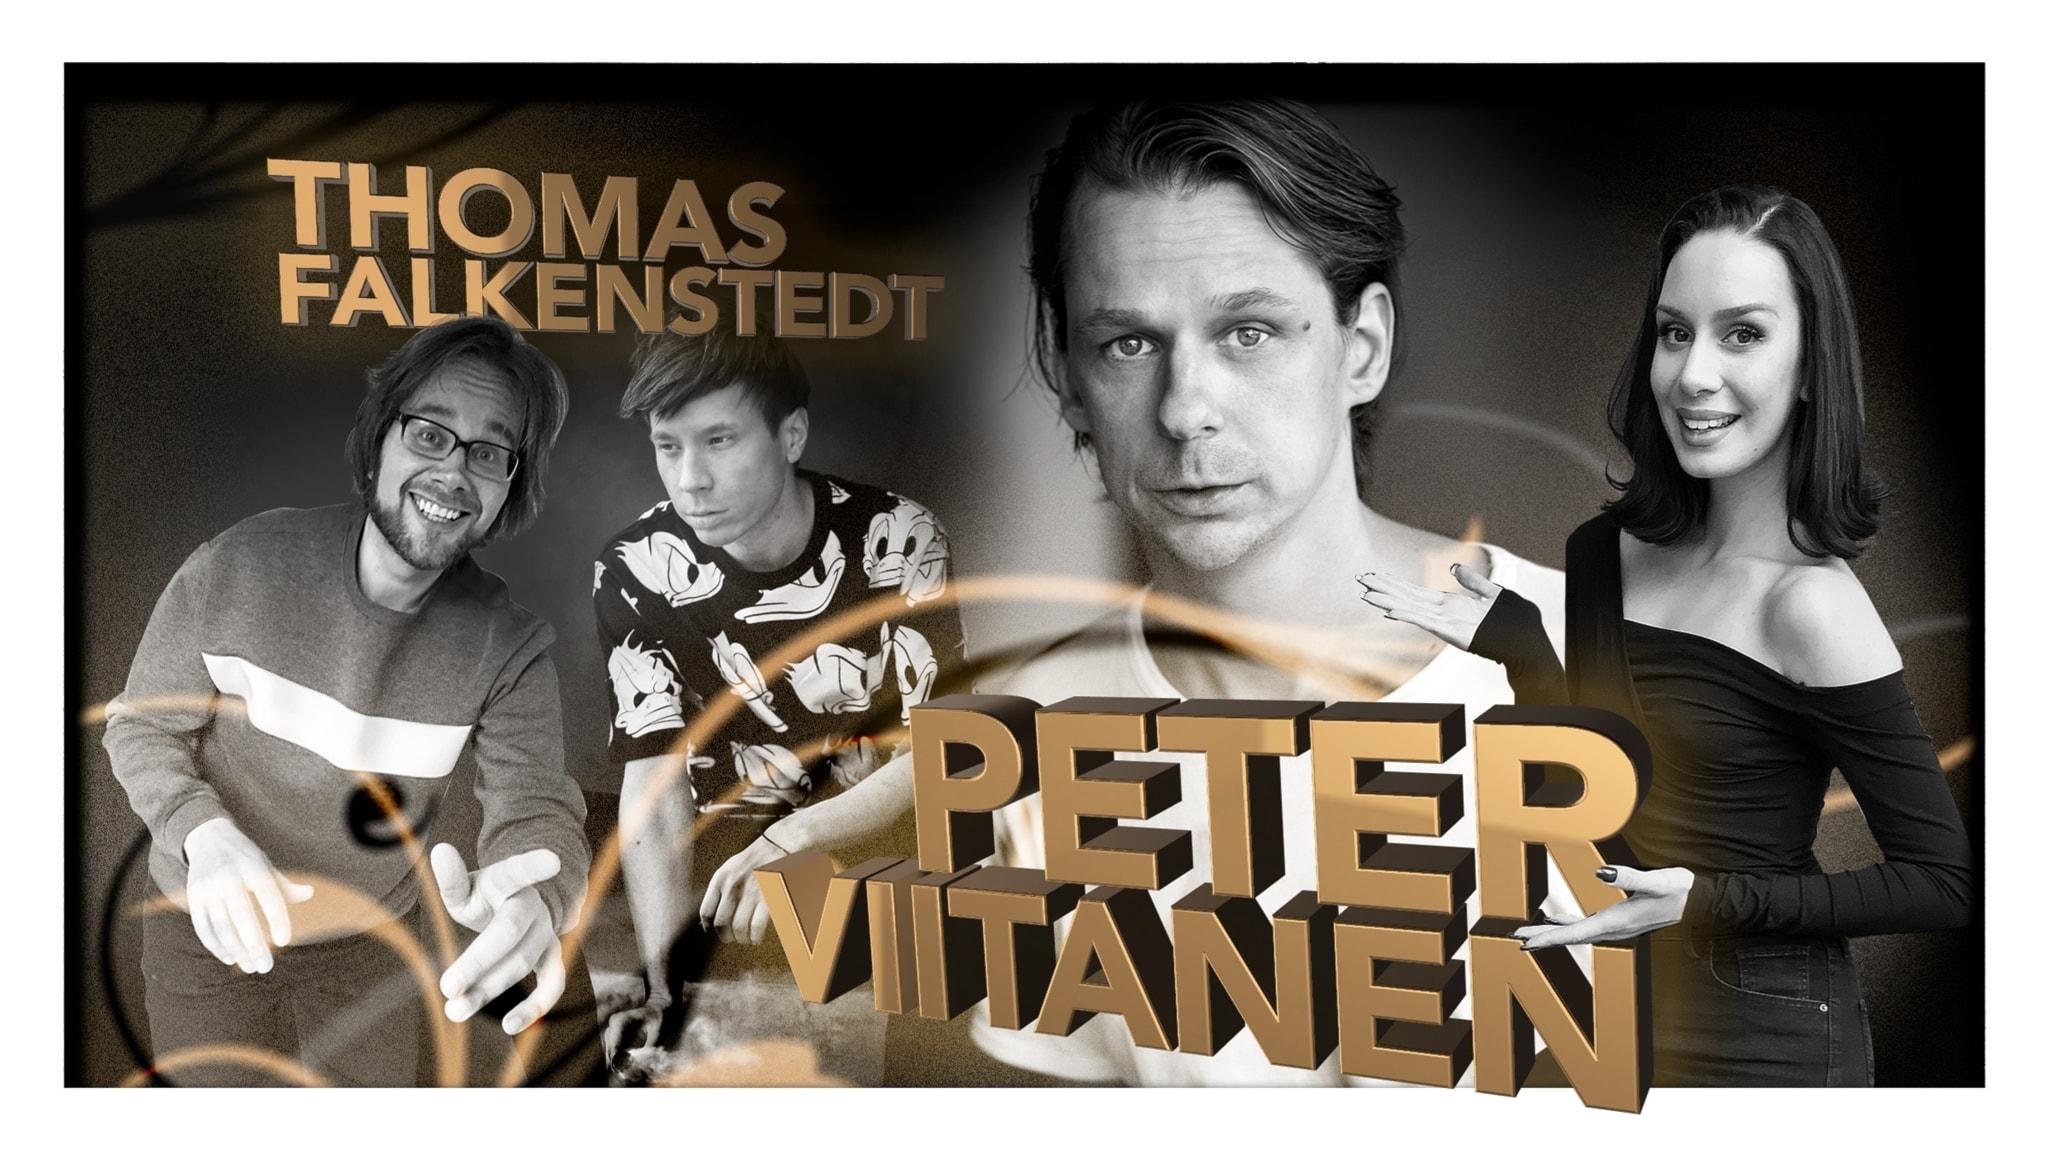 Filmsnack med Peter Viitanen och vårens modetrender med Thomas Falkenstedt